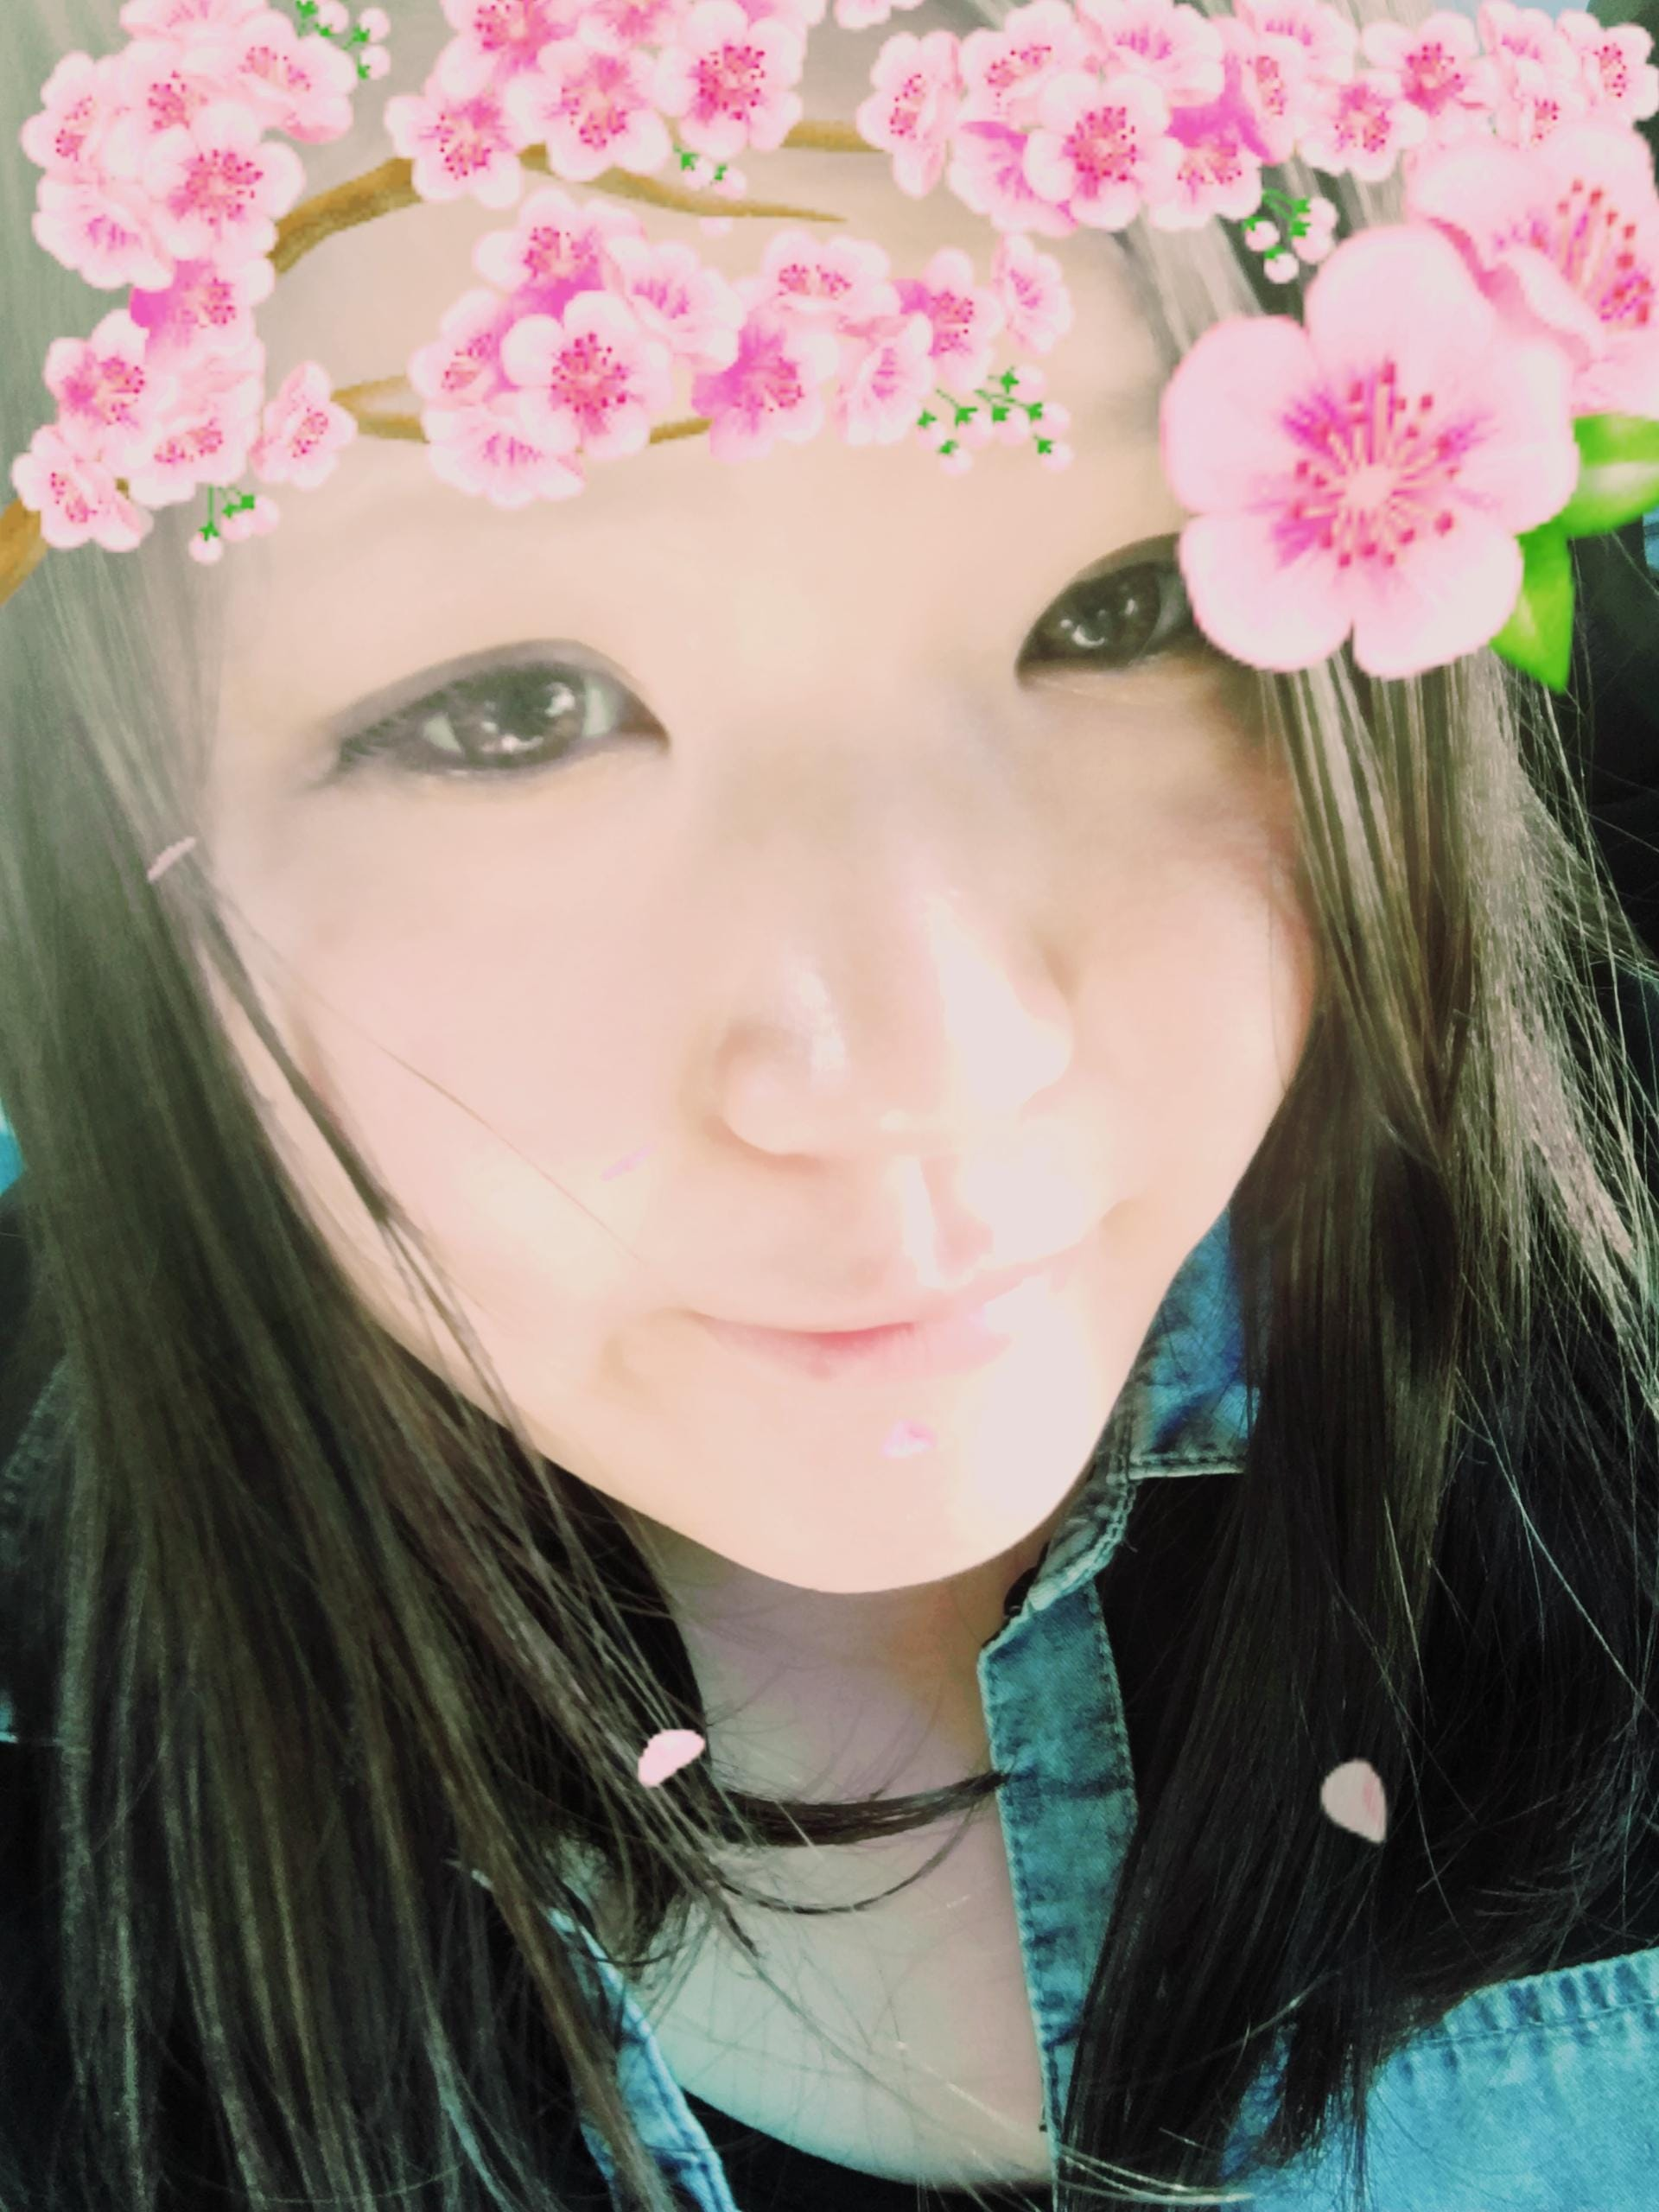 https://s3-ap-northeast-1.amazonaws.com/files.deli-fuzoku.jp/img/shop/snbcom/diary/3772602/d_0_20170914154202890.JPG